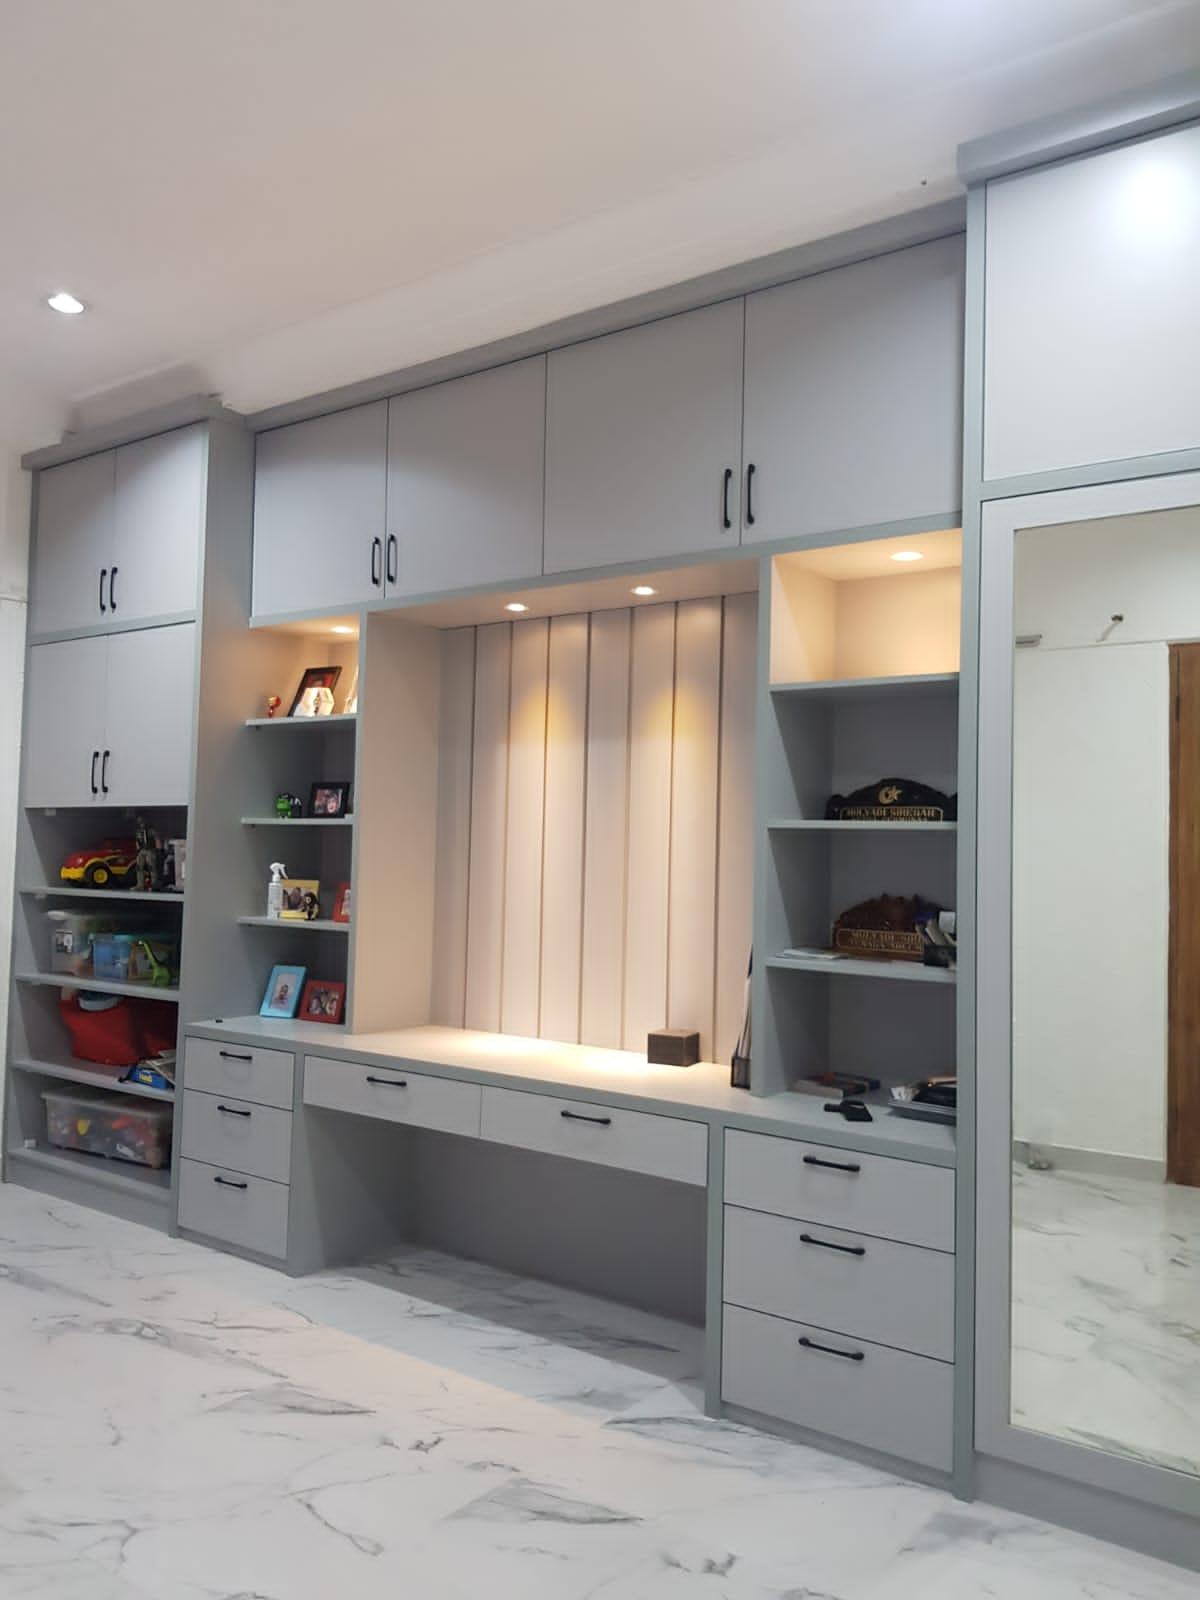 Project Belia Kitchen Set - Lemari Serbaguna - Pondok Indah - Ibu Tyaimage00007